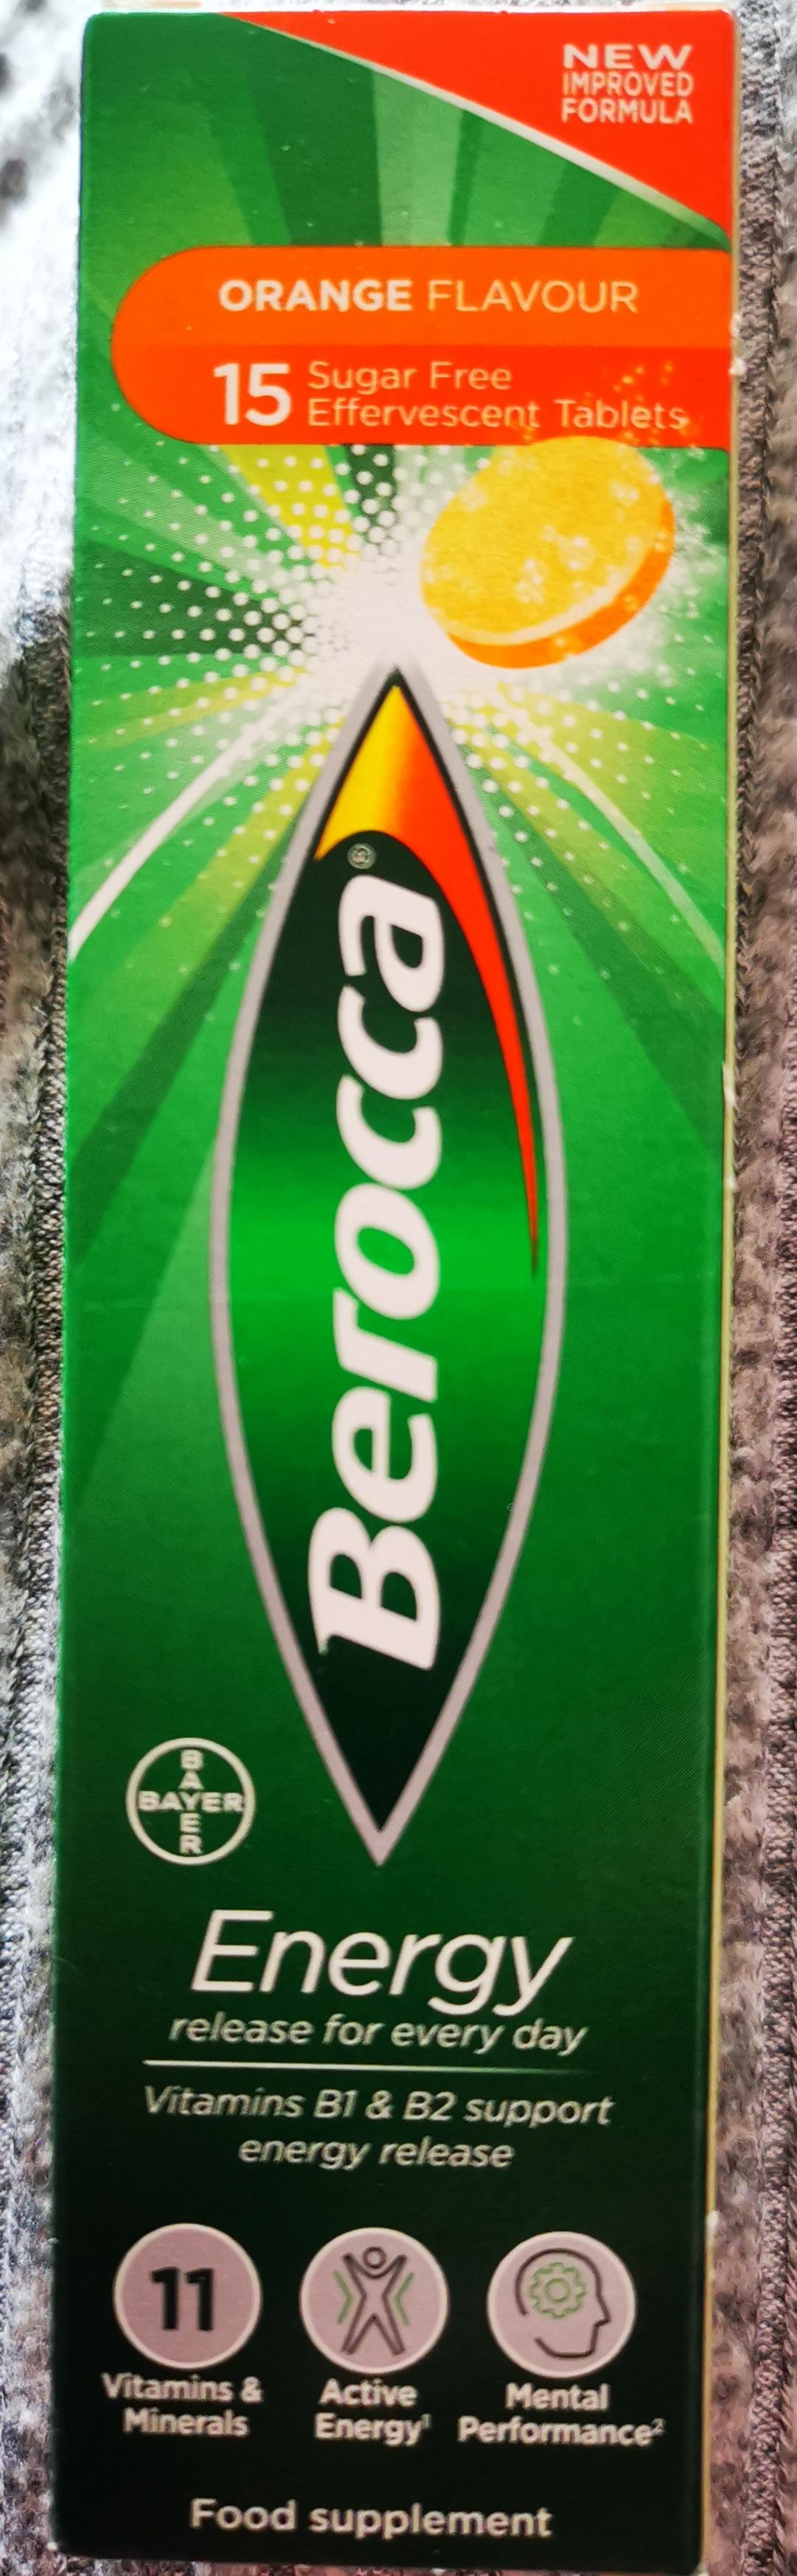 Berocca x 15 Orange Flavour Effervescent Tablets, £1 In Store @ OneBelow (Robroyston, Glasgow)